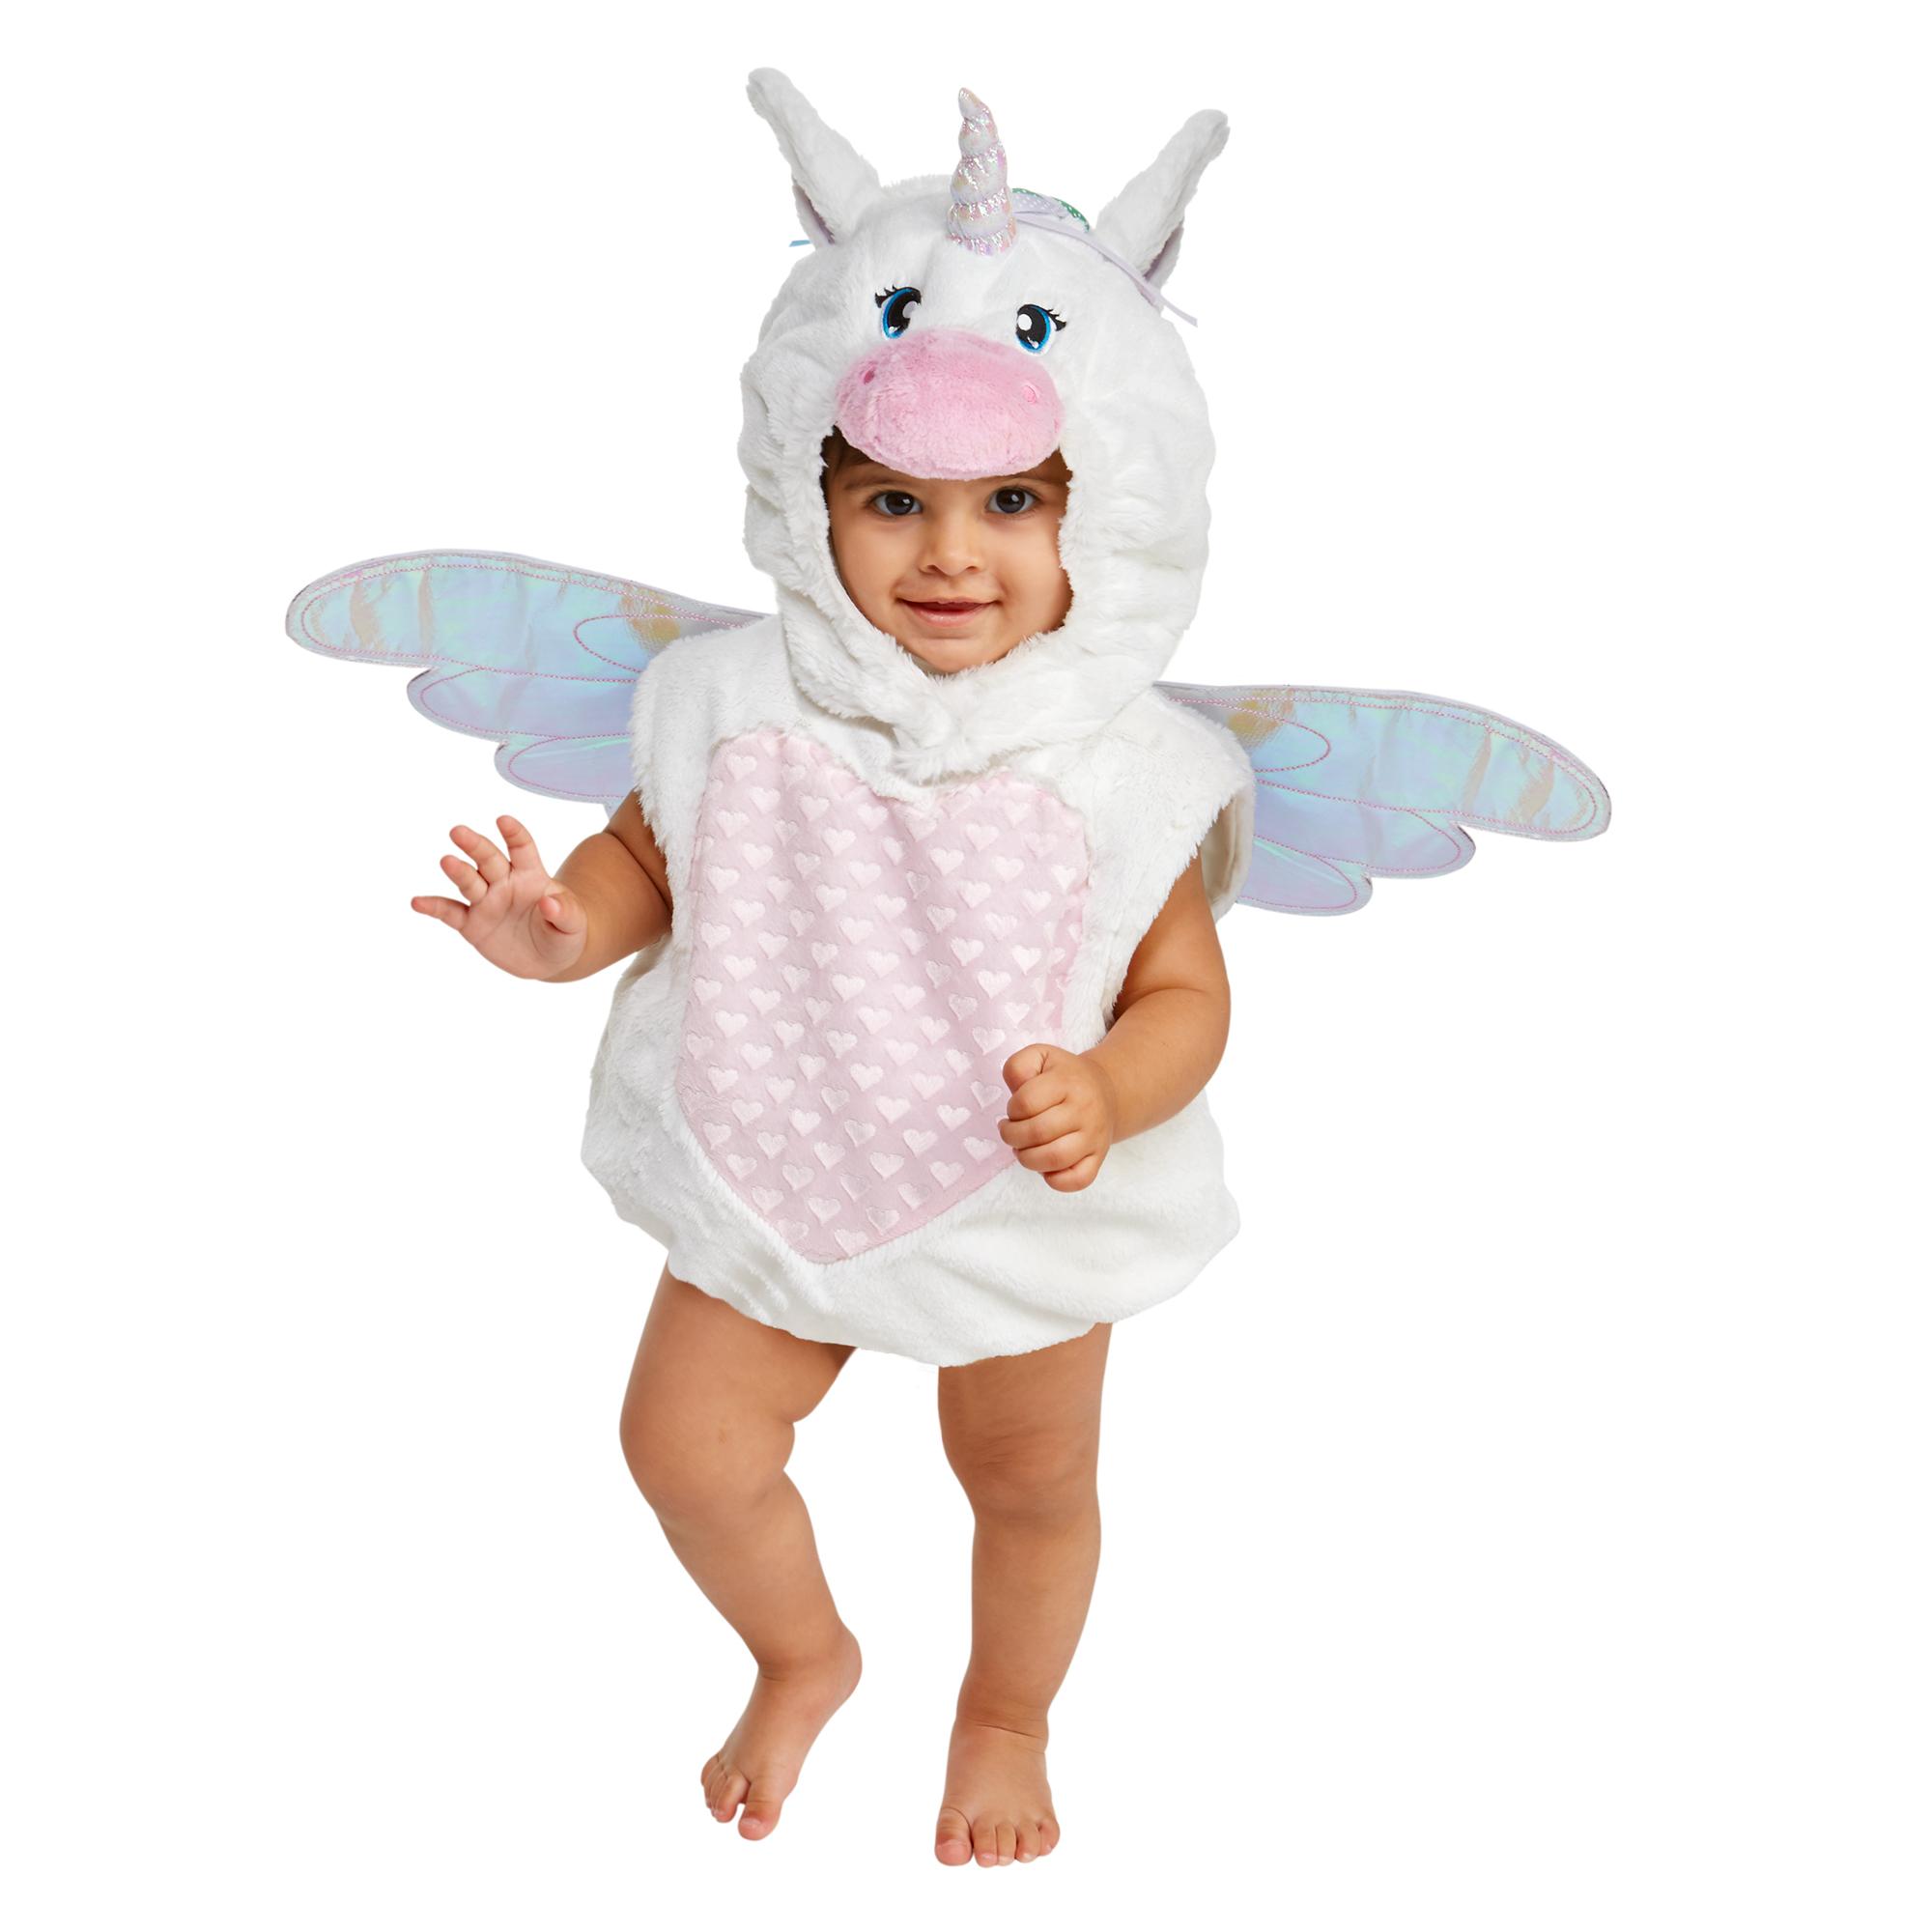 Infant Magical Unicorn Bubble 6-12M Halloween Dress Up $4.99